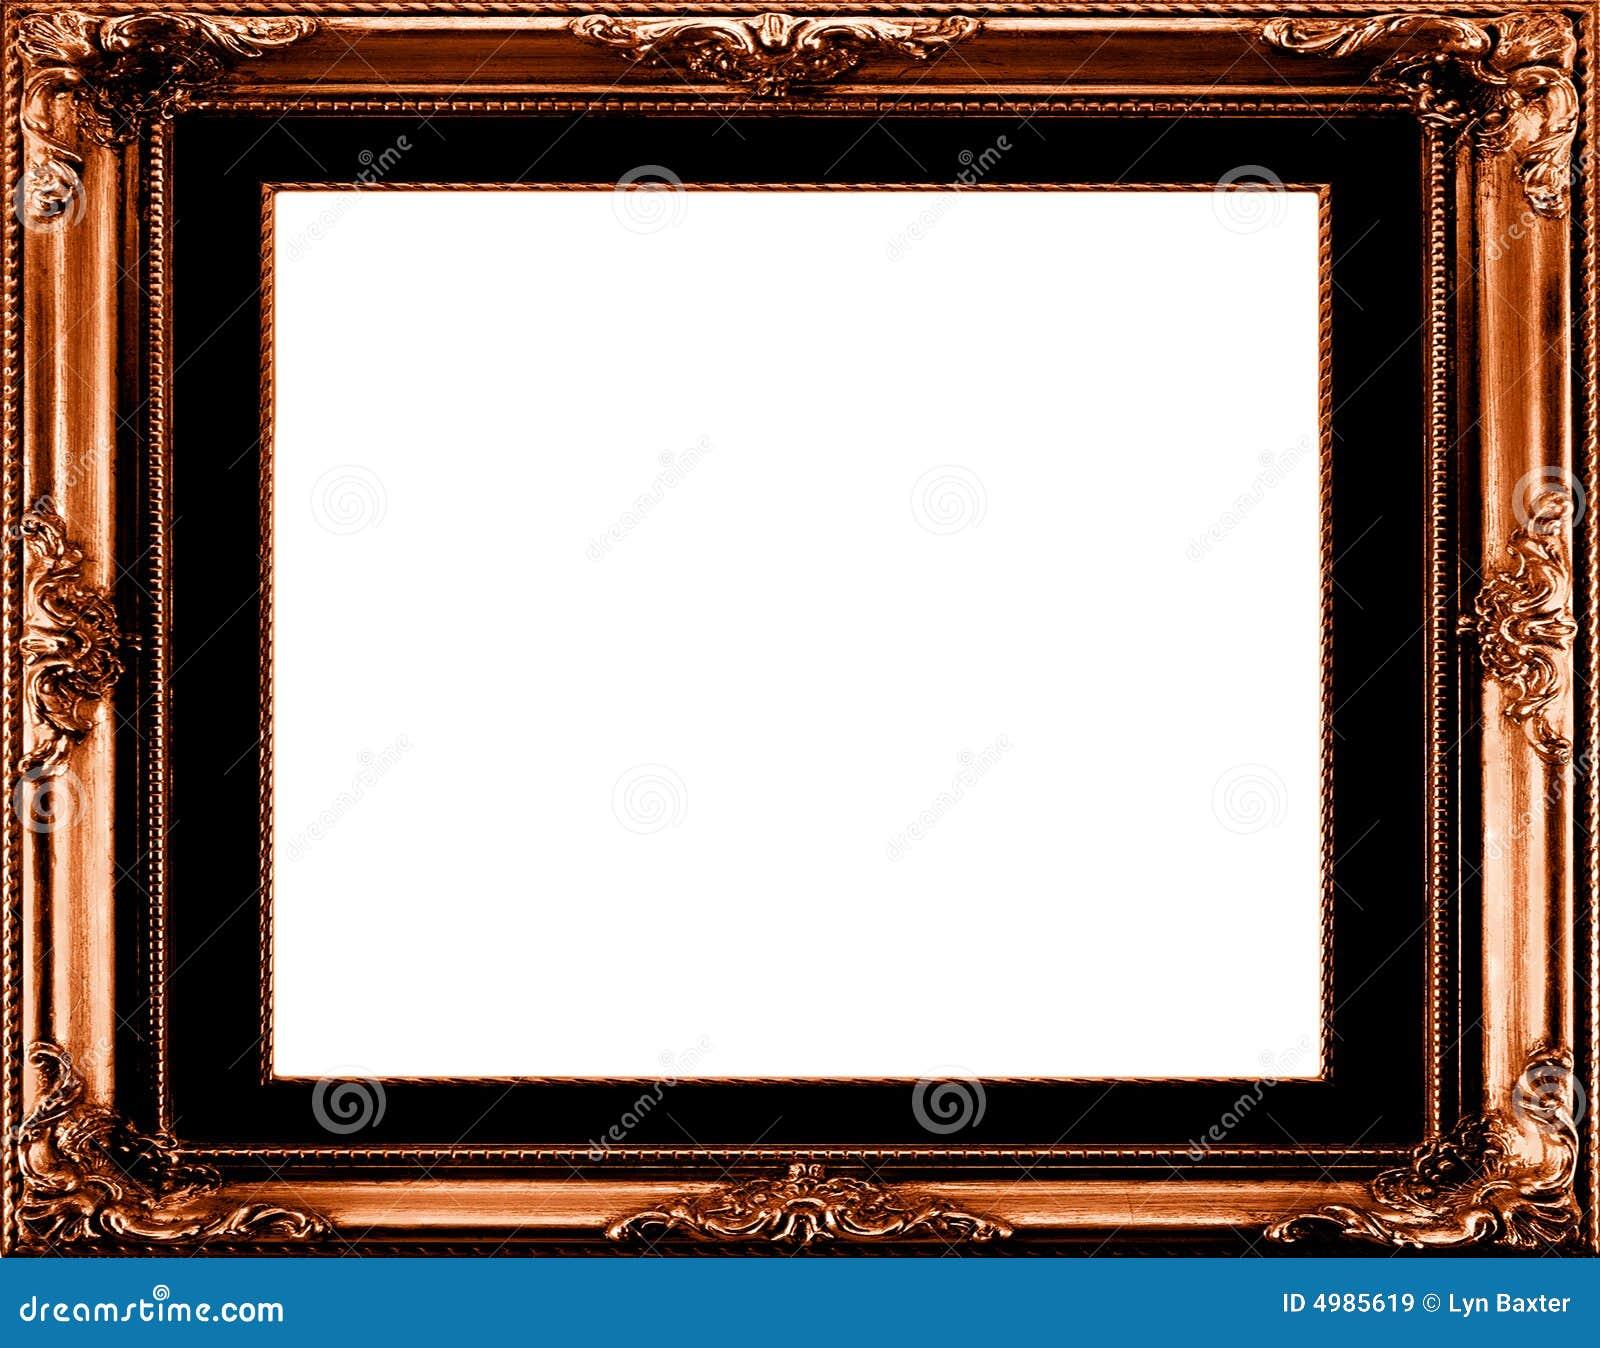 Antique gilt frame stock illustration. Illustration of blank - 4985619